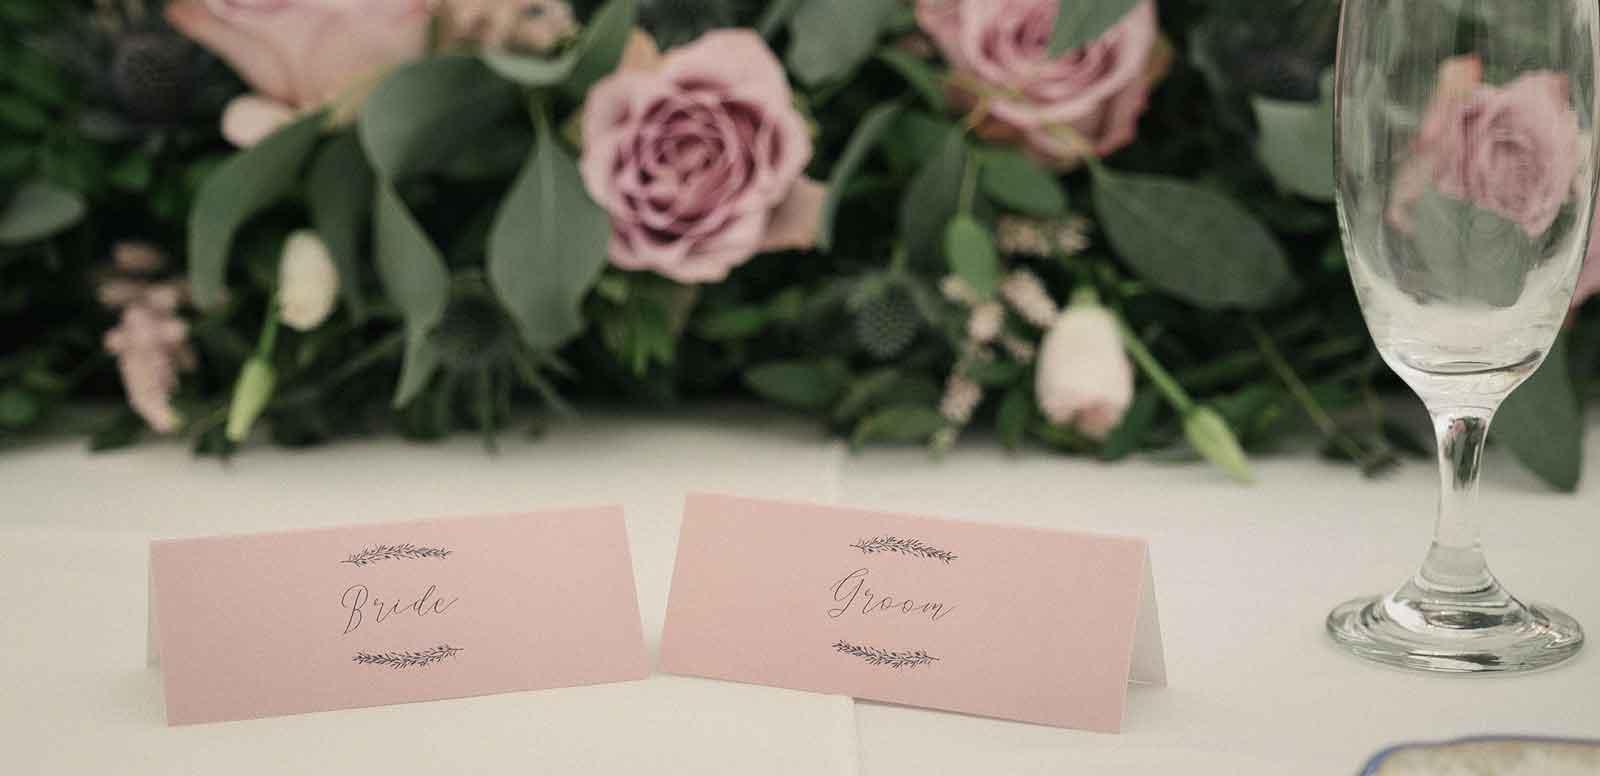 wedding name places